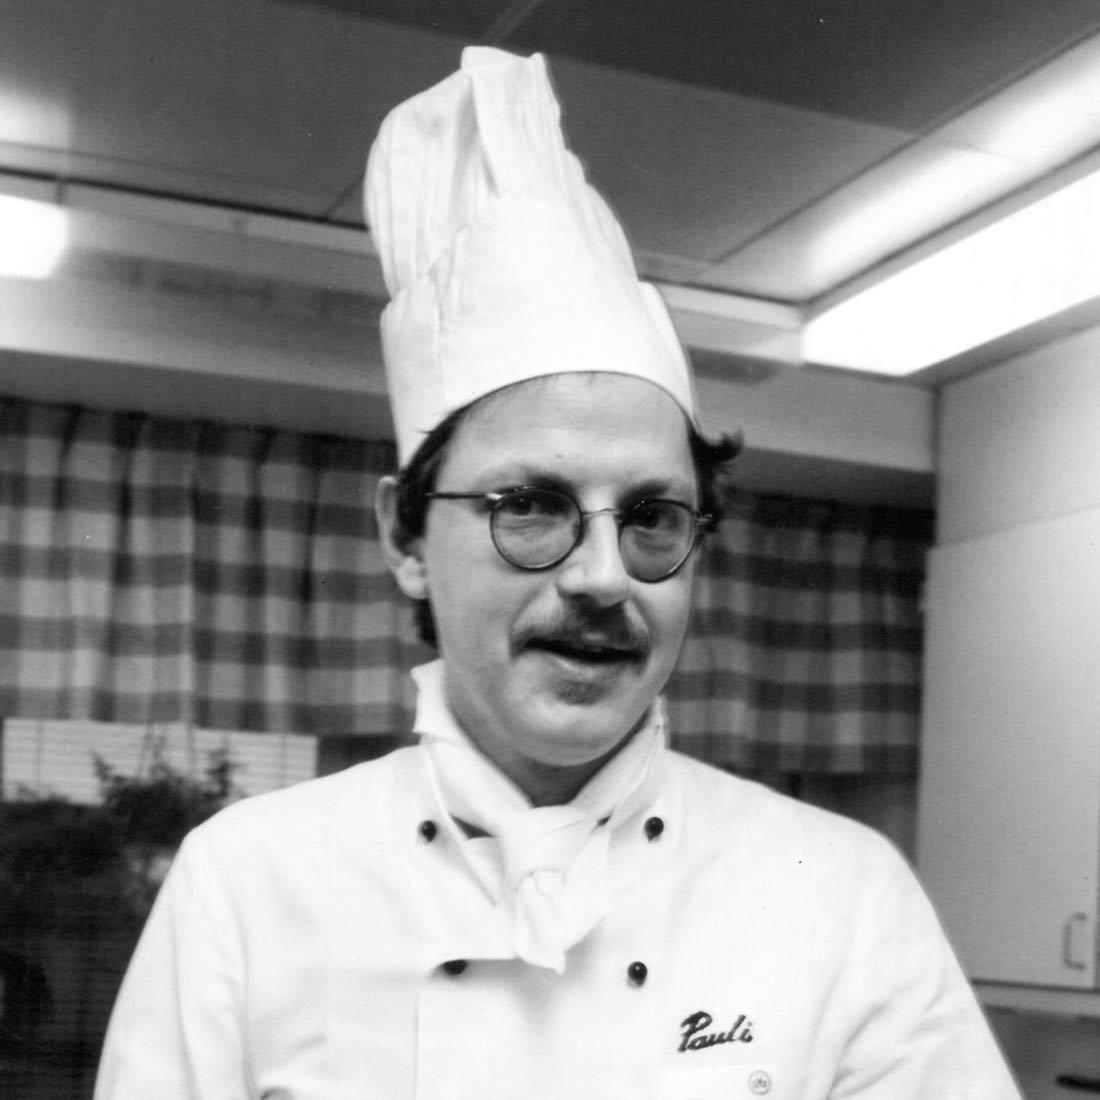 Mats Ödman vinner Årets Kock 1983